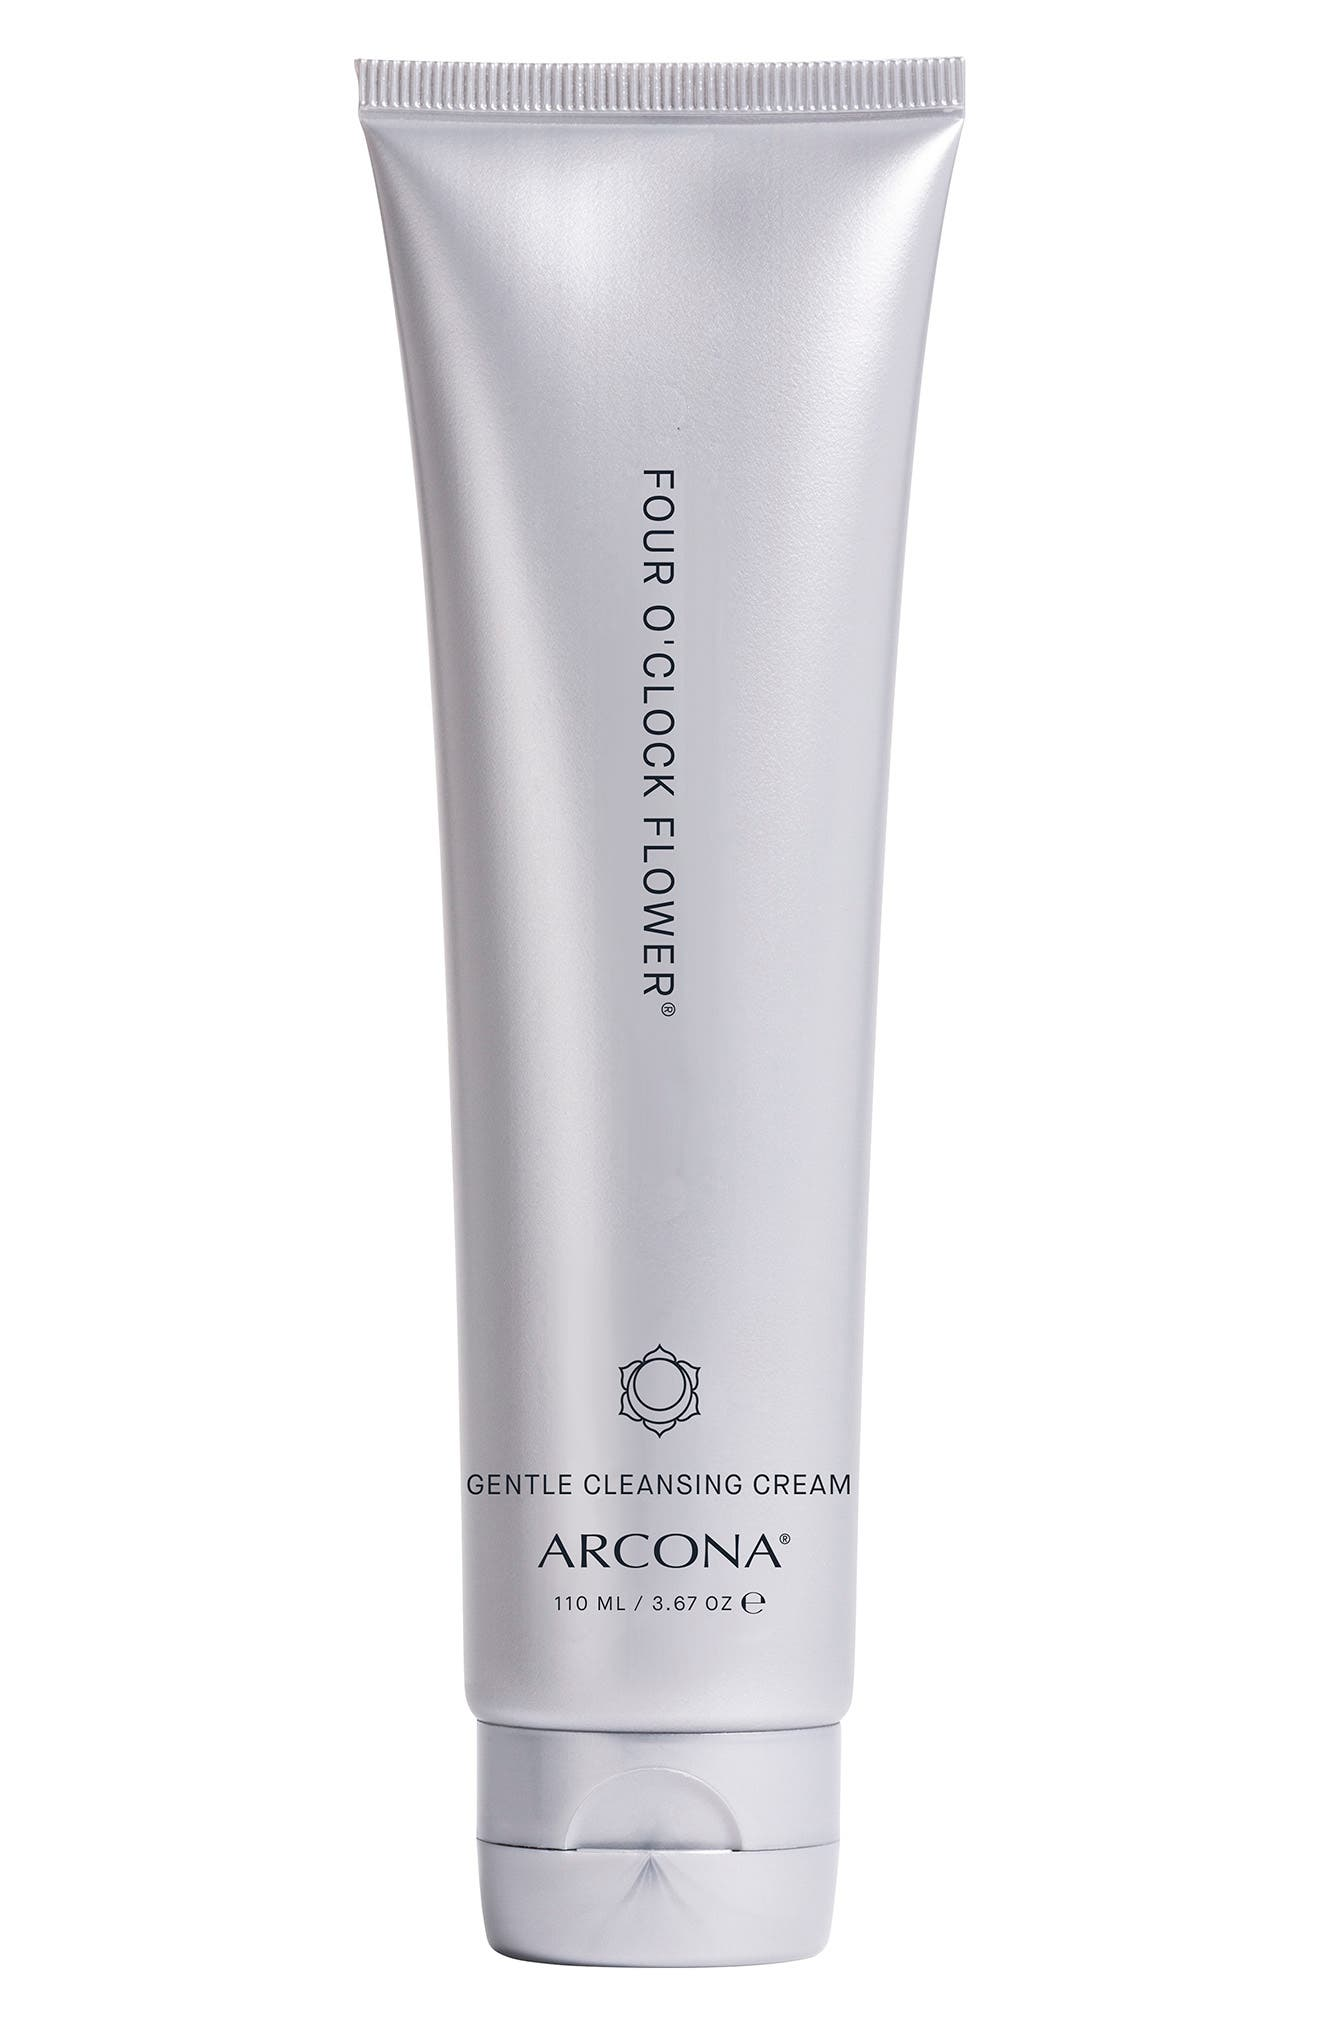 Four O'Clock Flower Cleanser Gentle Cleanser For Sensitive Skin